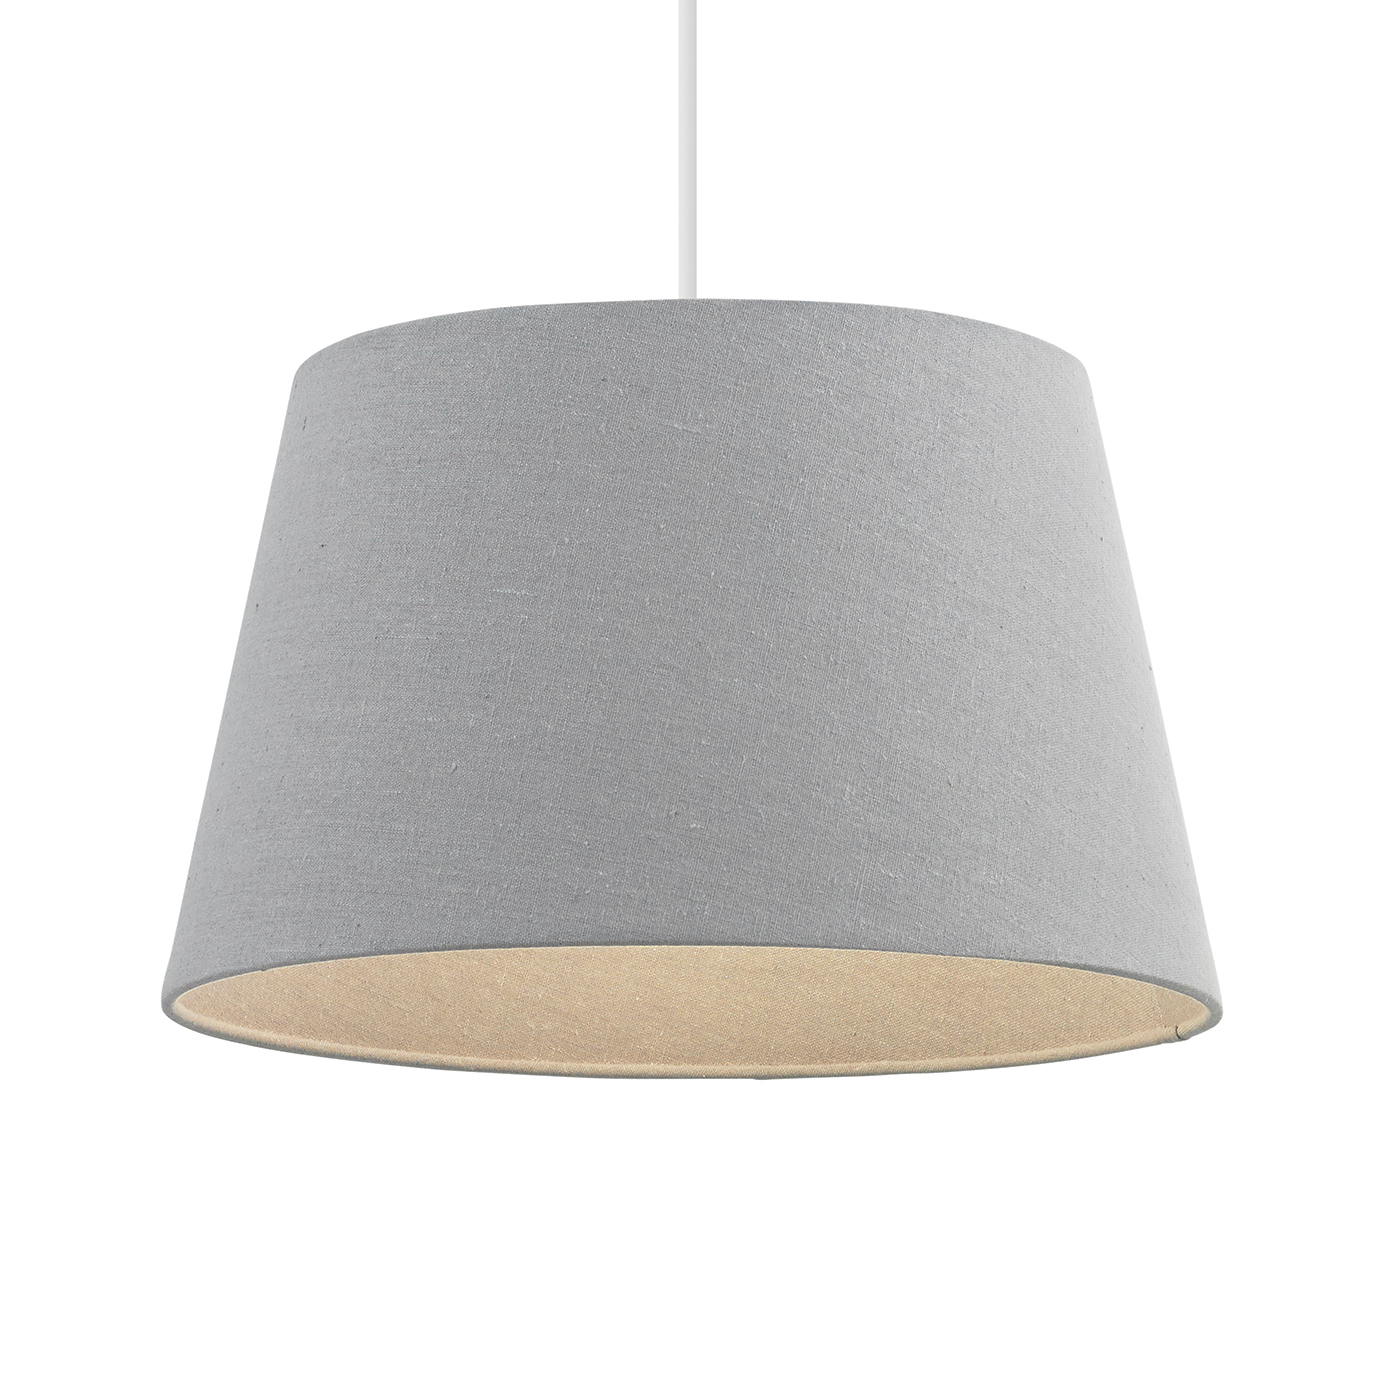 electrical supplies north east lighting home commercial lighting. Black Bedroom Furniture Sets. Home Design Ideas